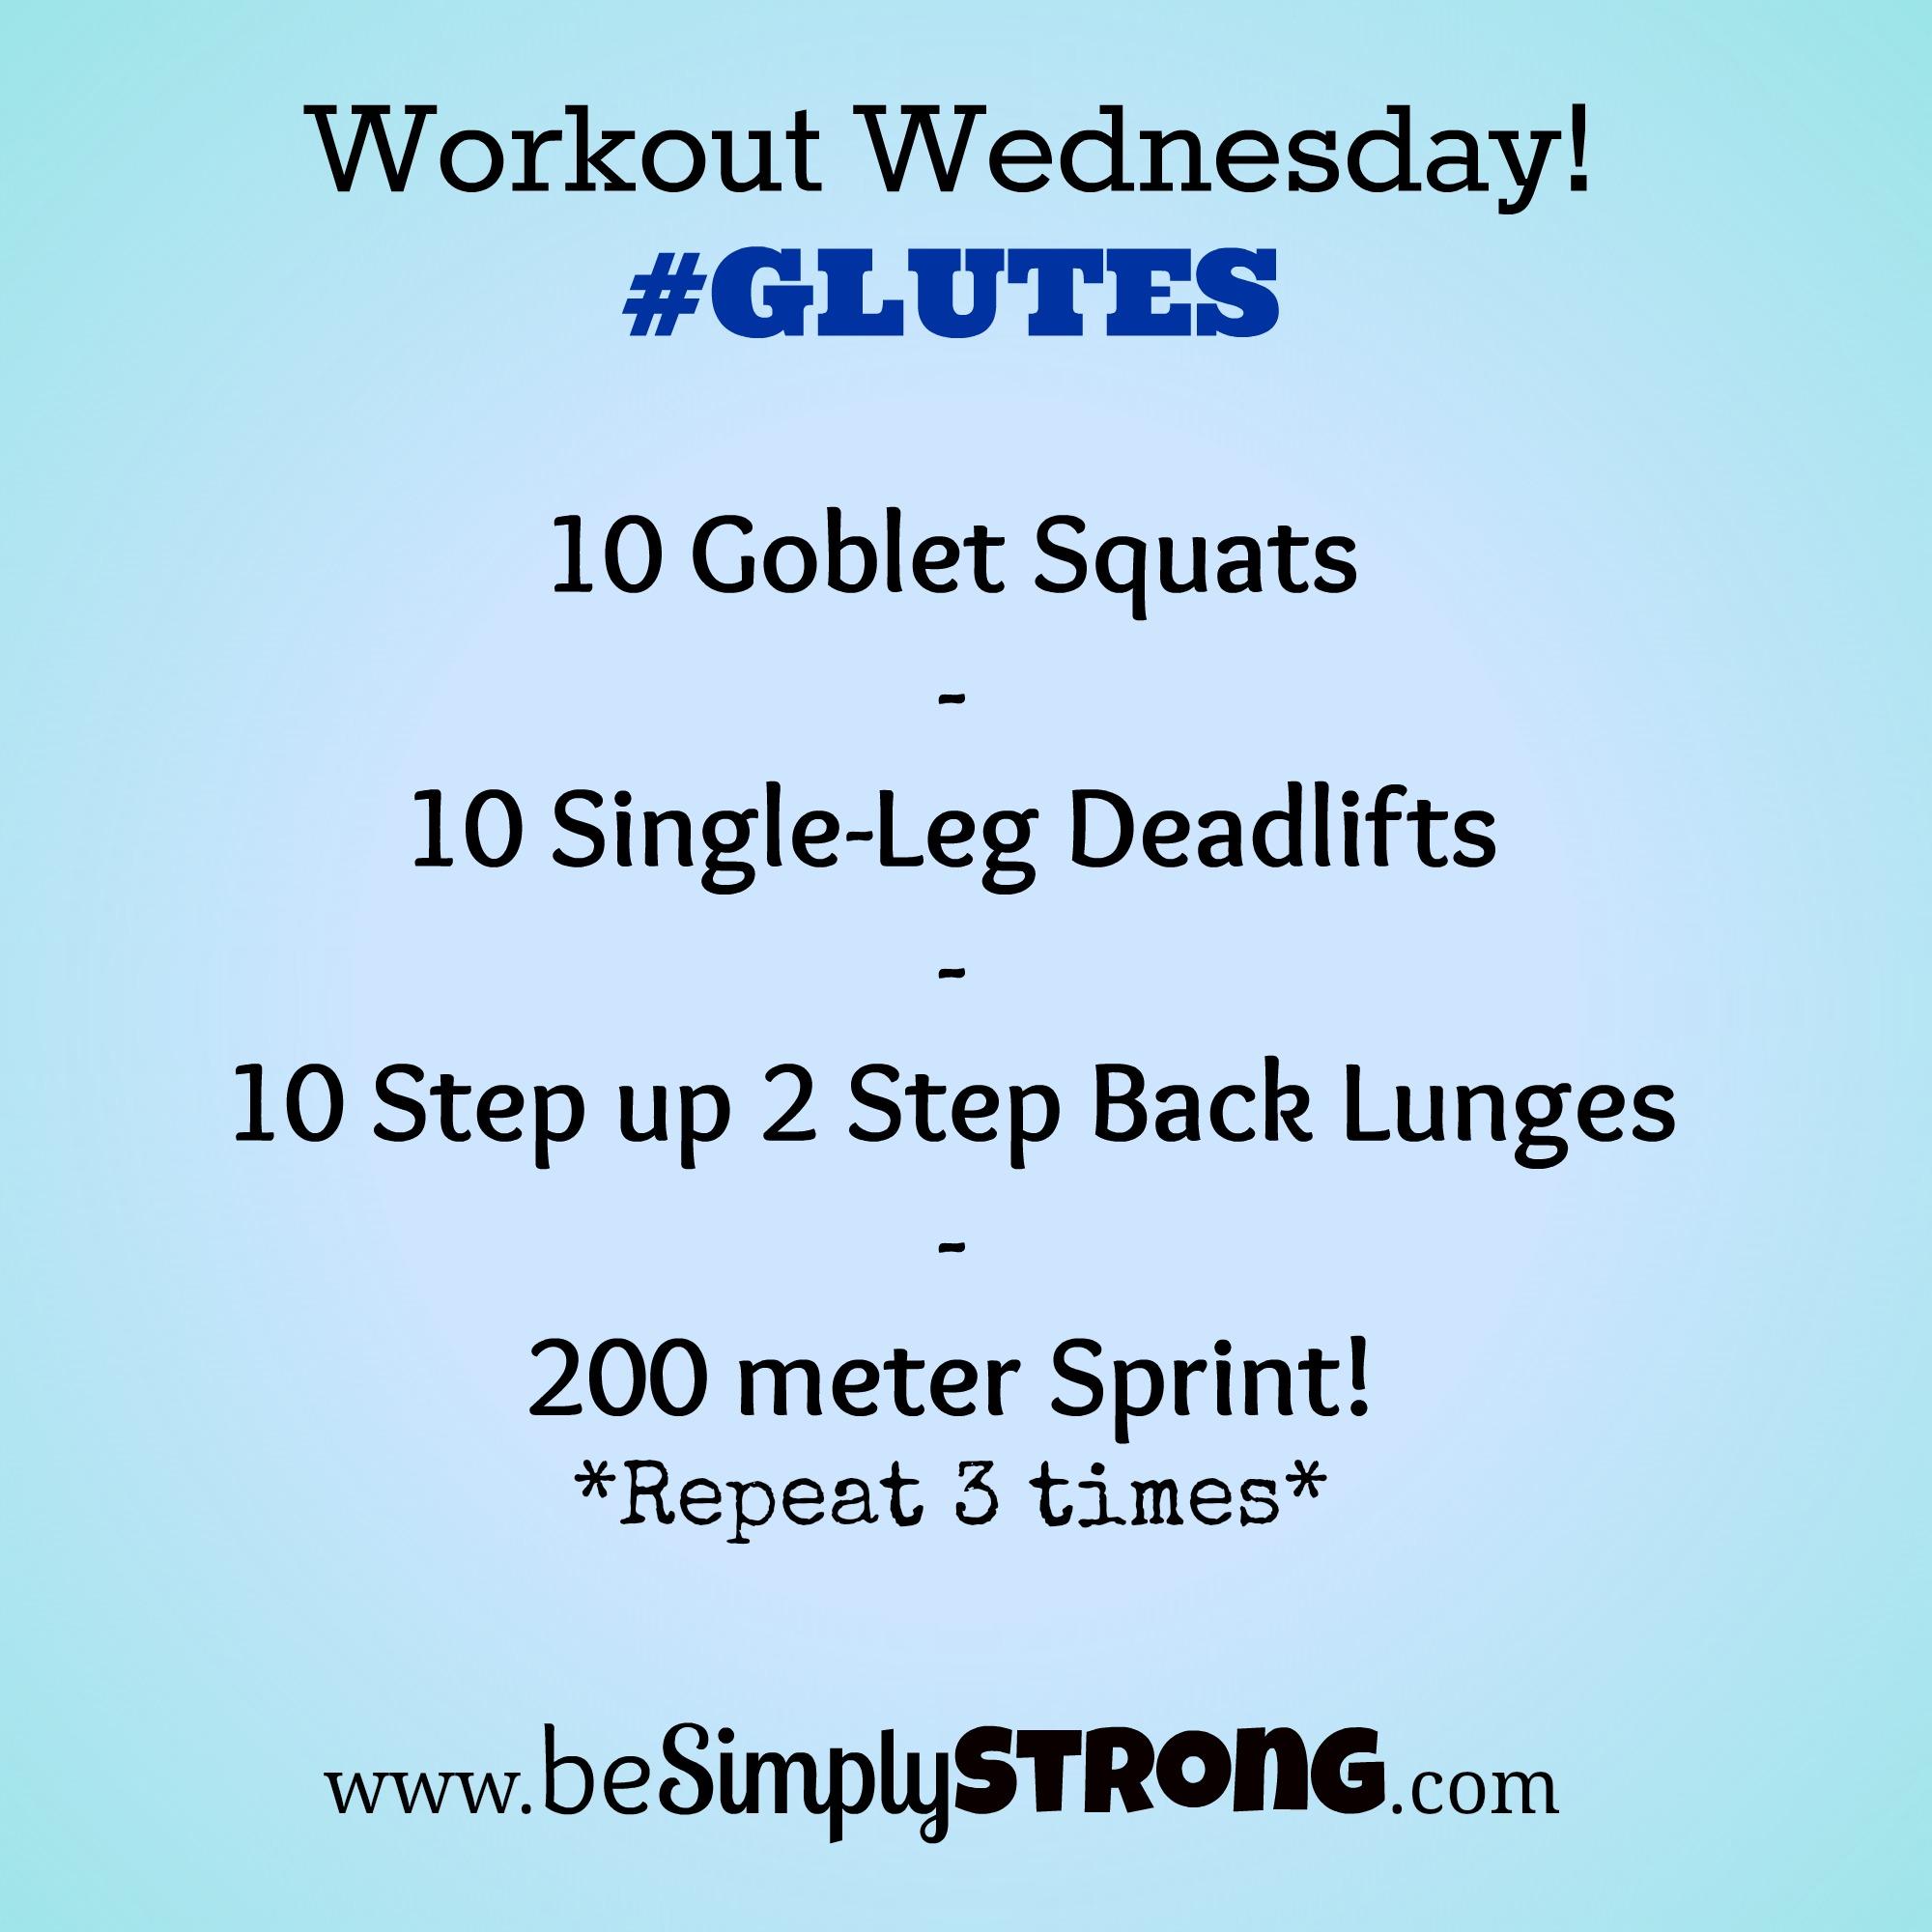 Workout Wednesday 4-16-14.jpg